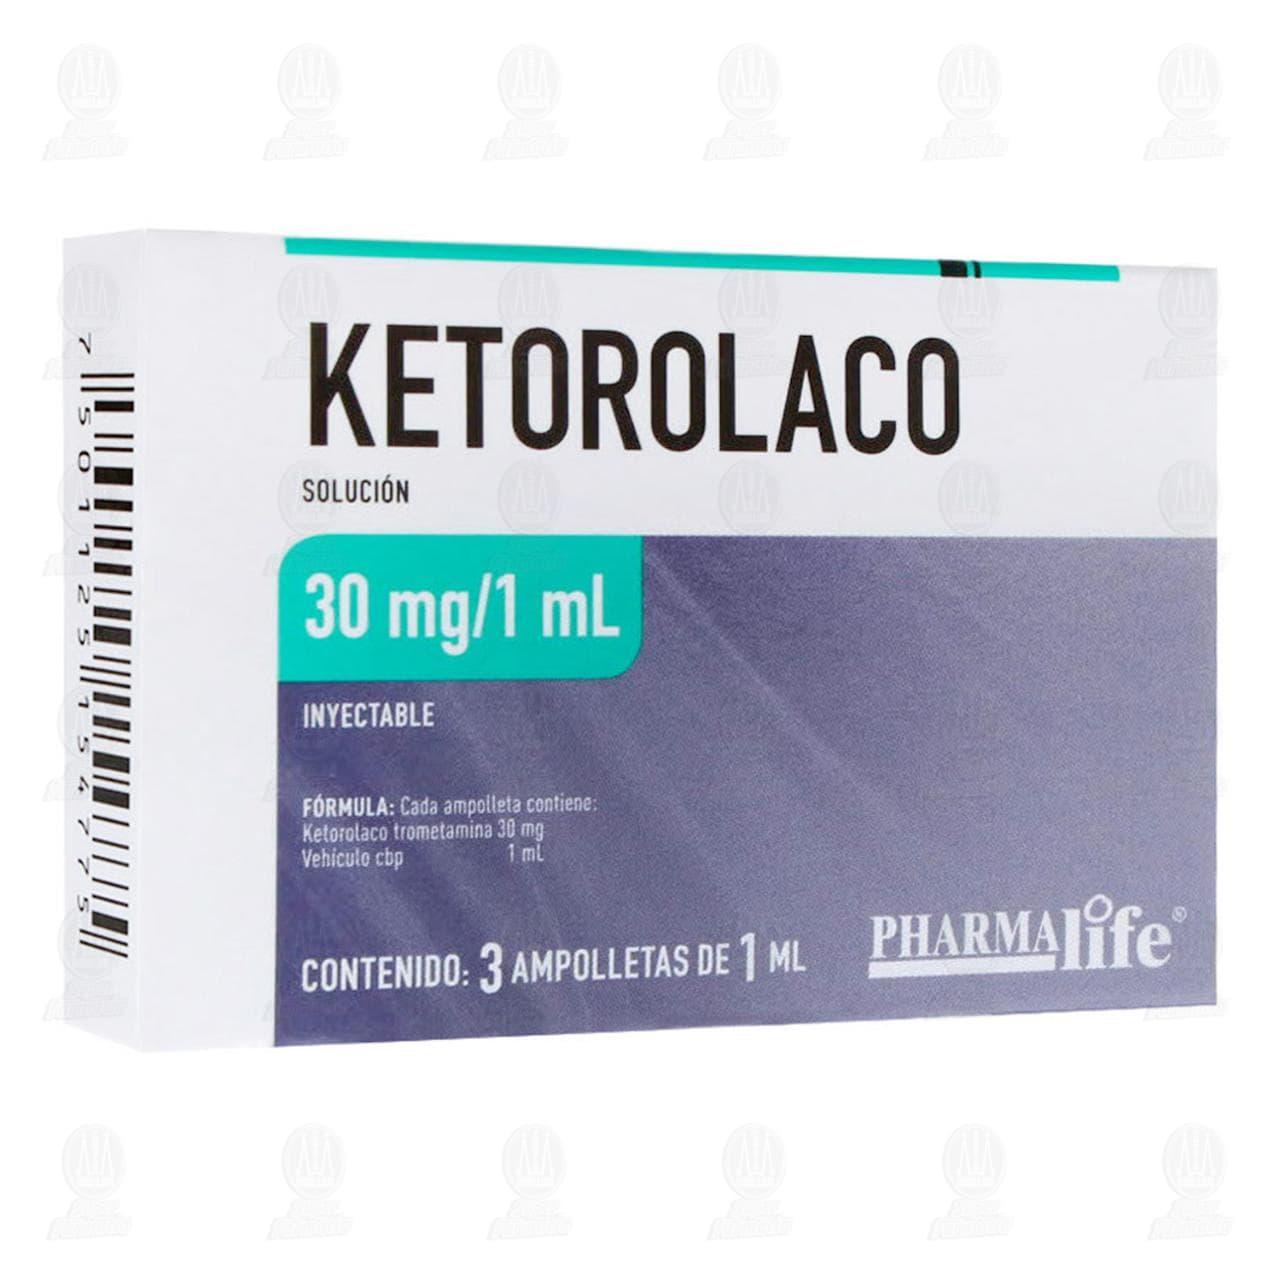 Comprar Ketorolaco 30mg/1ml 3 Ampolletas Pharmalife en Farmacias Guadalajara